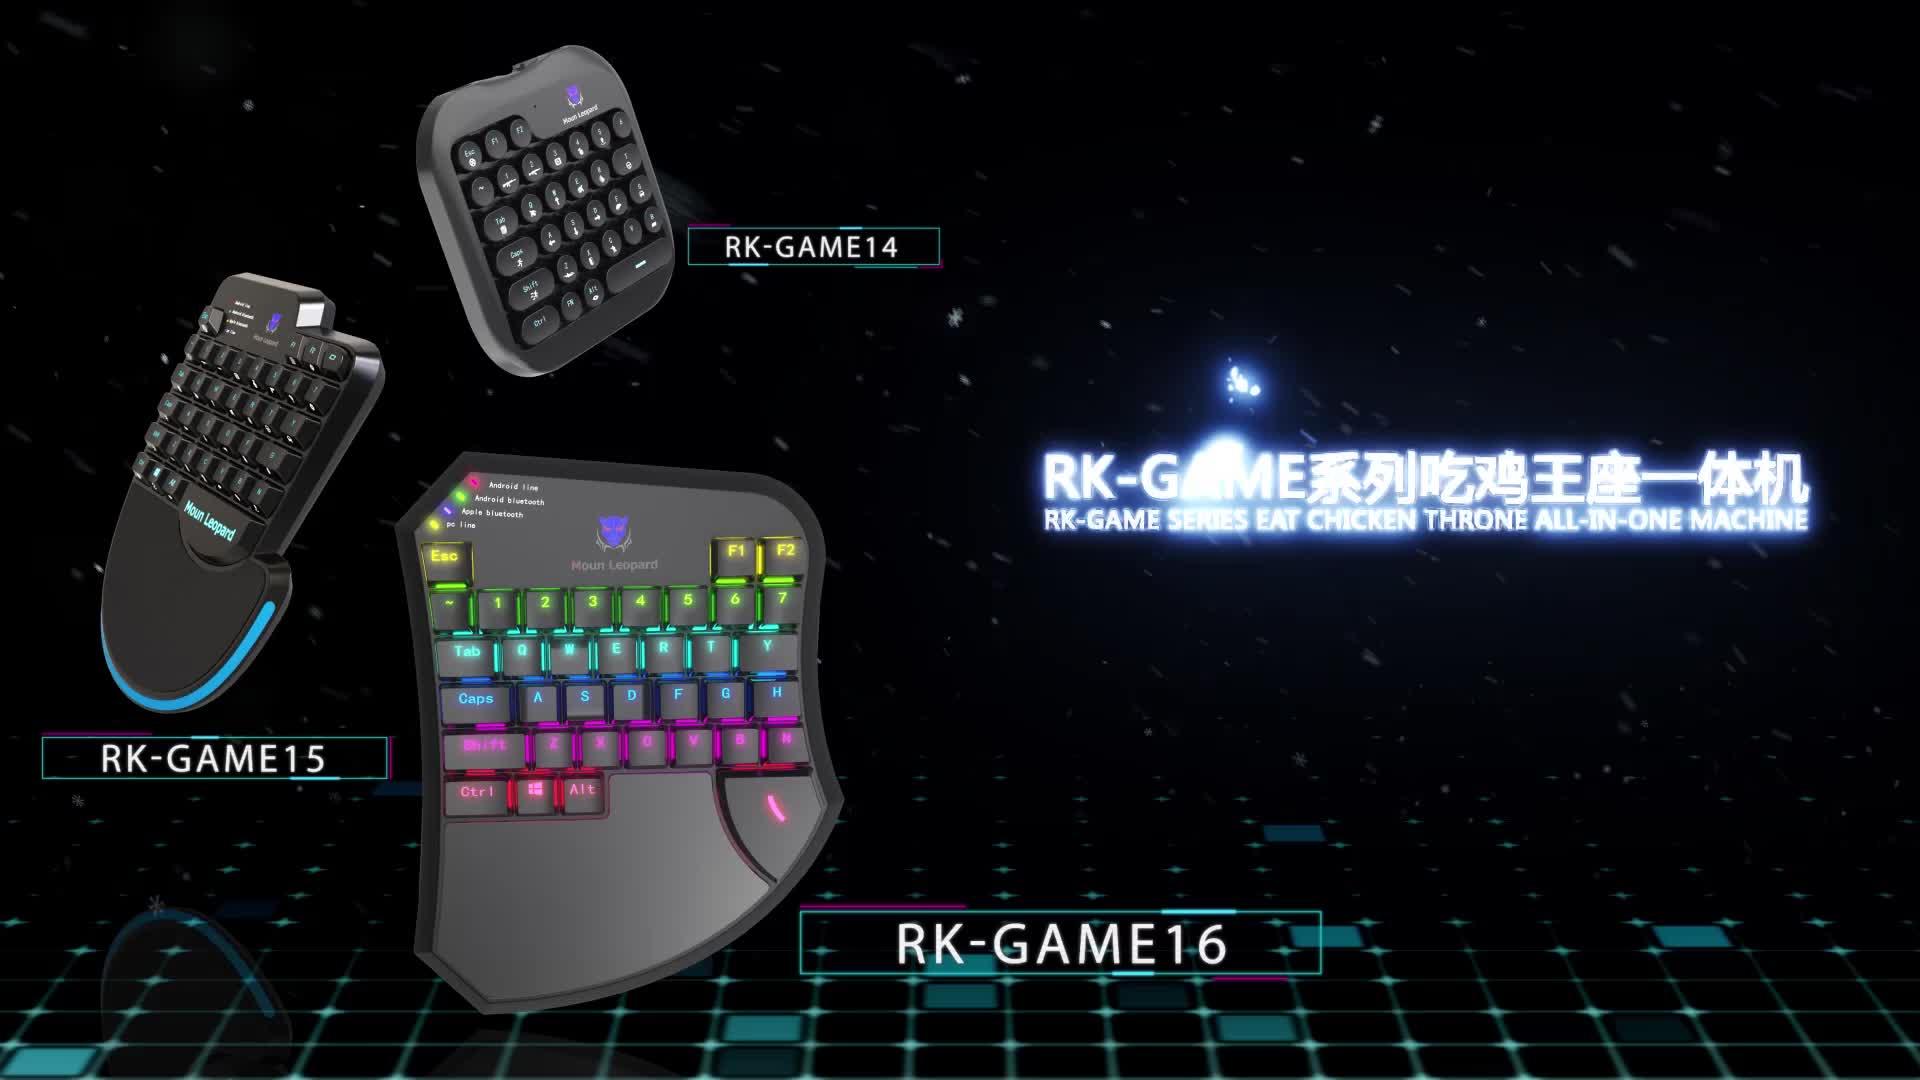 RKGAME-16 Mini Gaming Keyboard Mechanical Single One Hand wireless/wired rainbow Keyboard Mobile Game Left Hand for PUBG